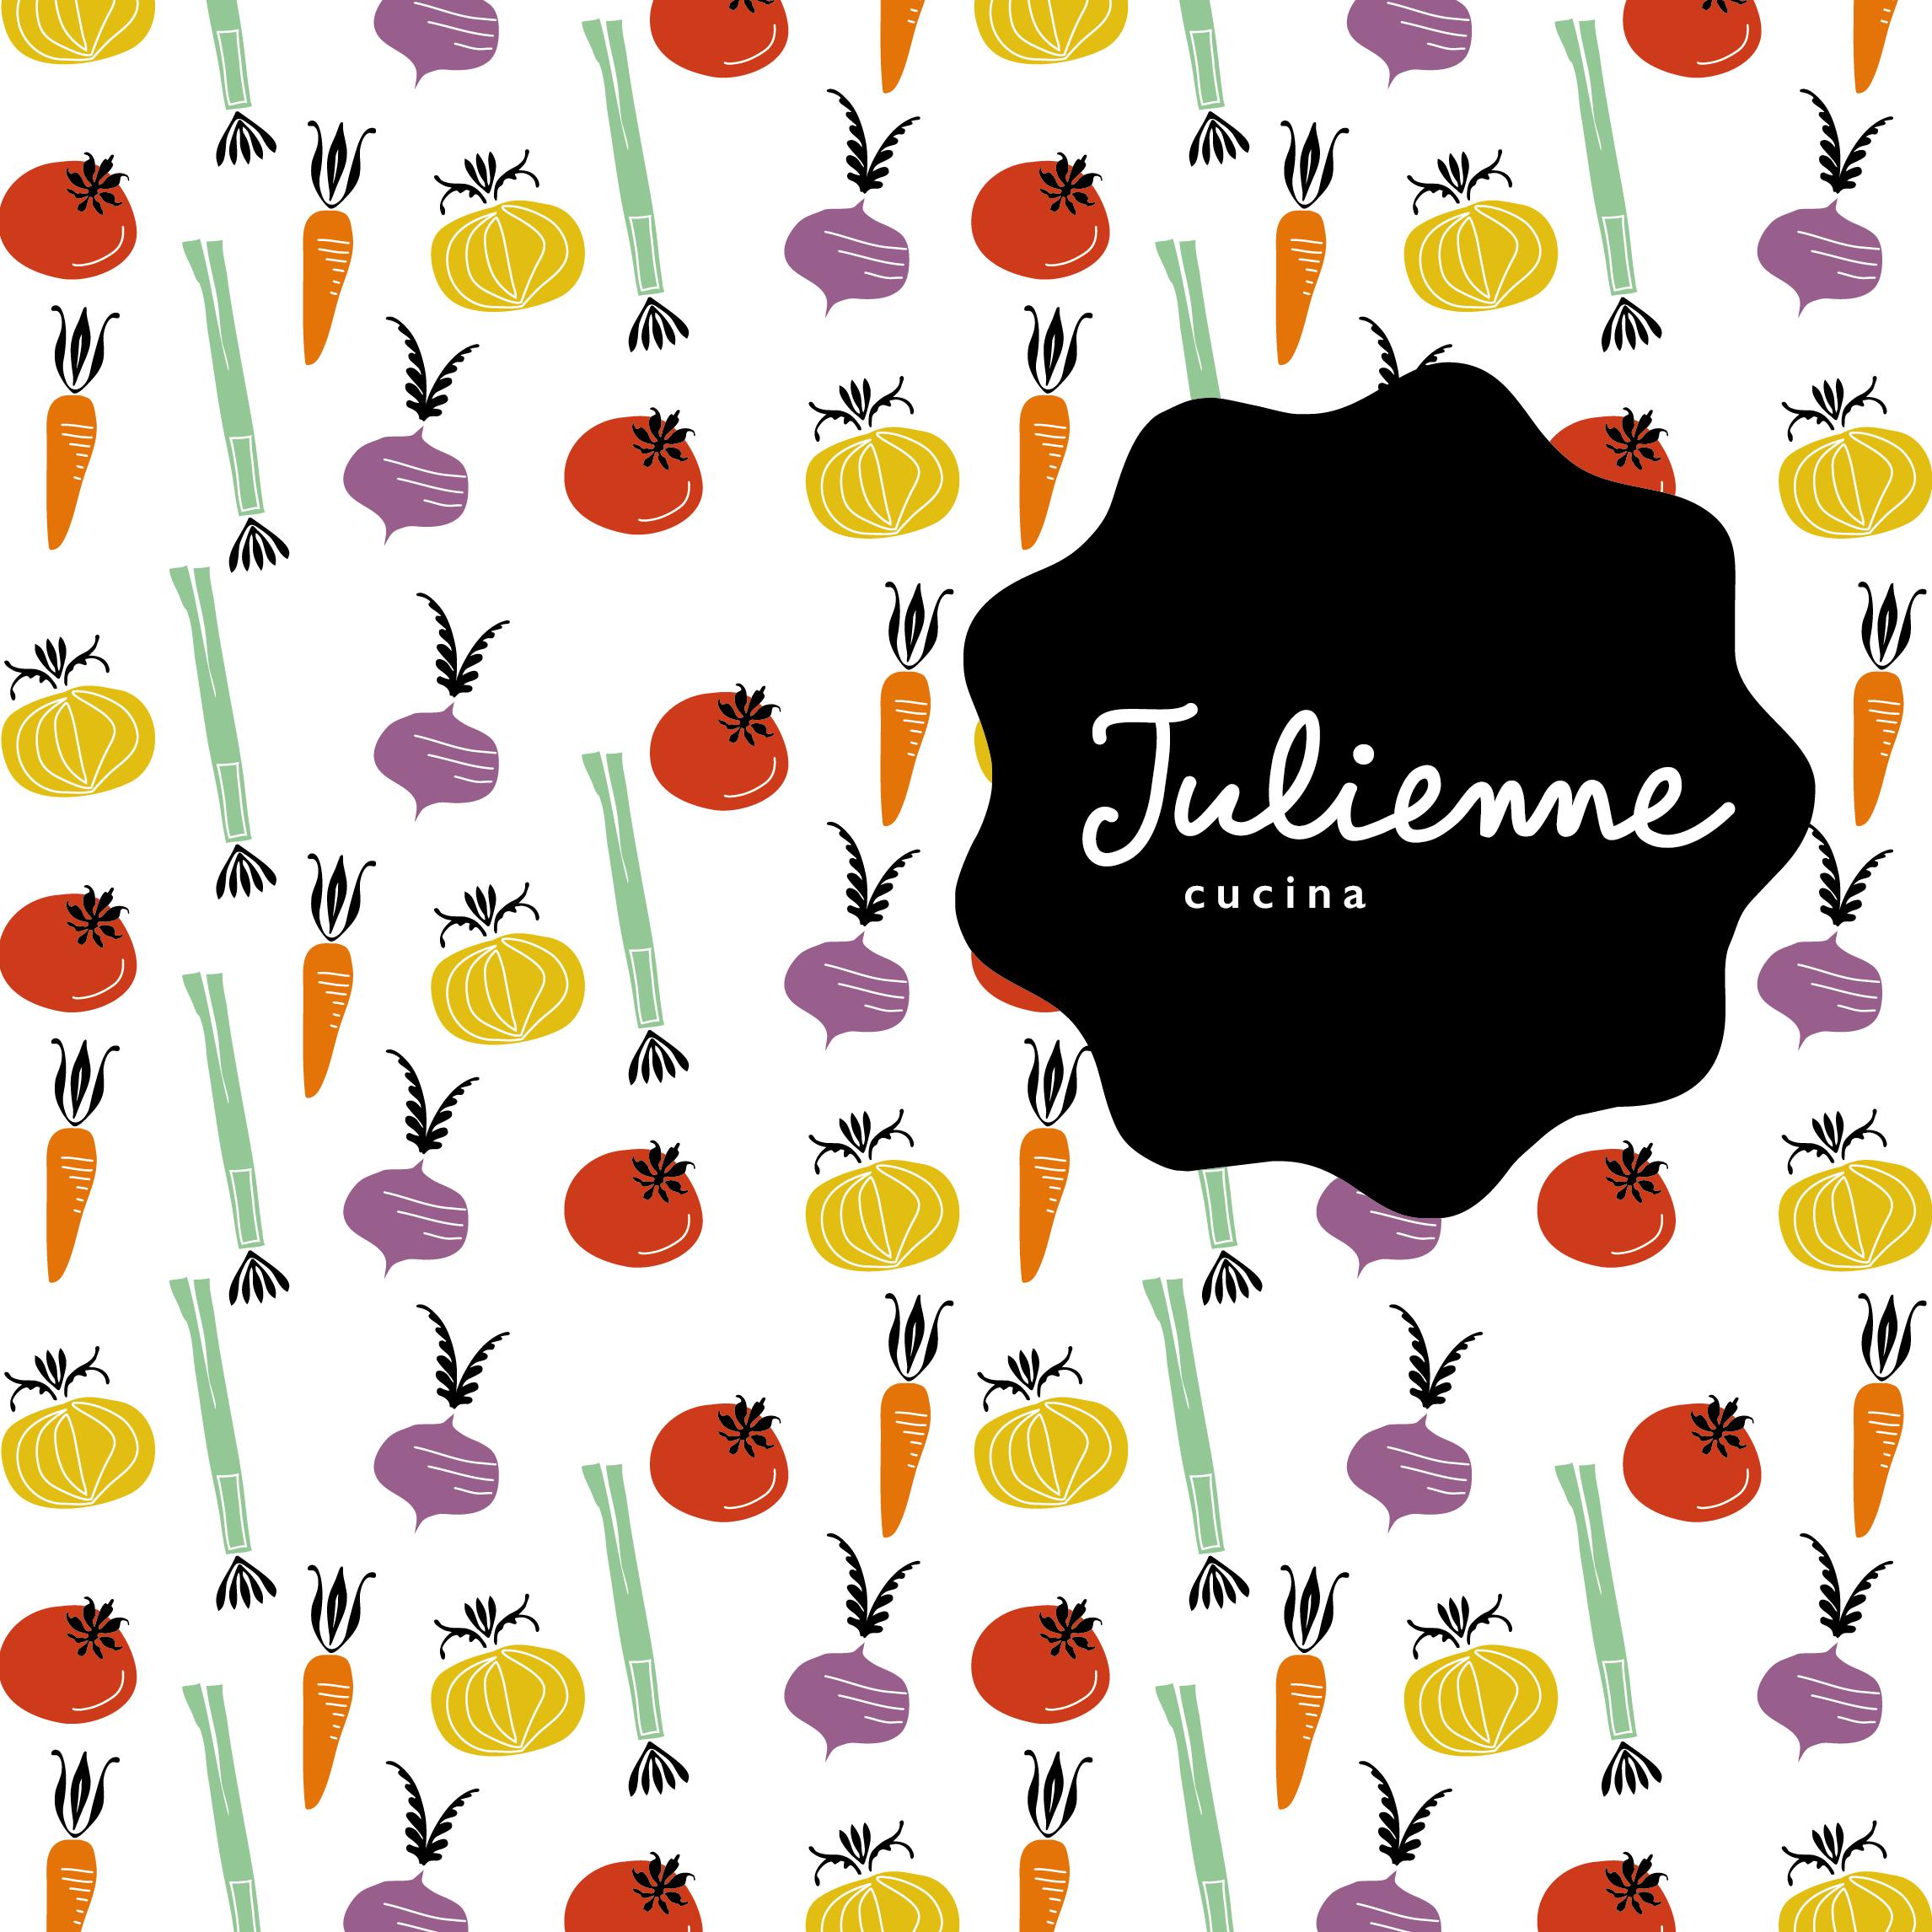 Julienne cucina format grafico - Studio Talpa